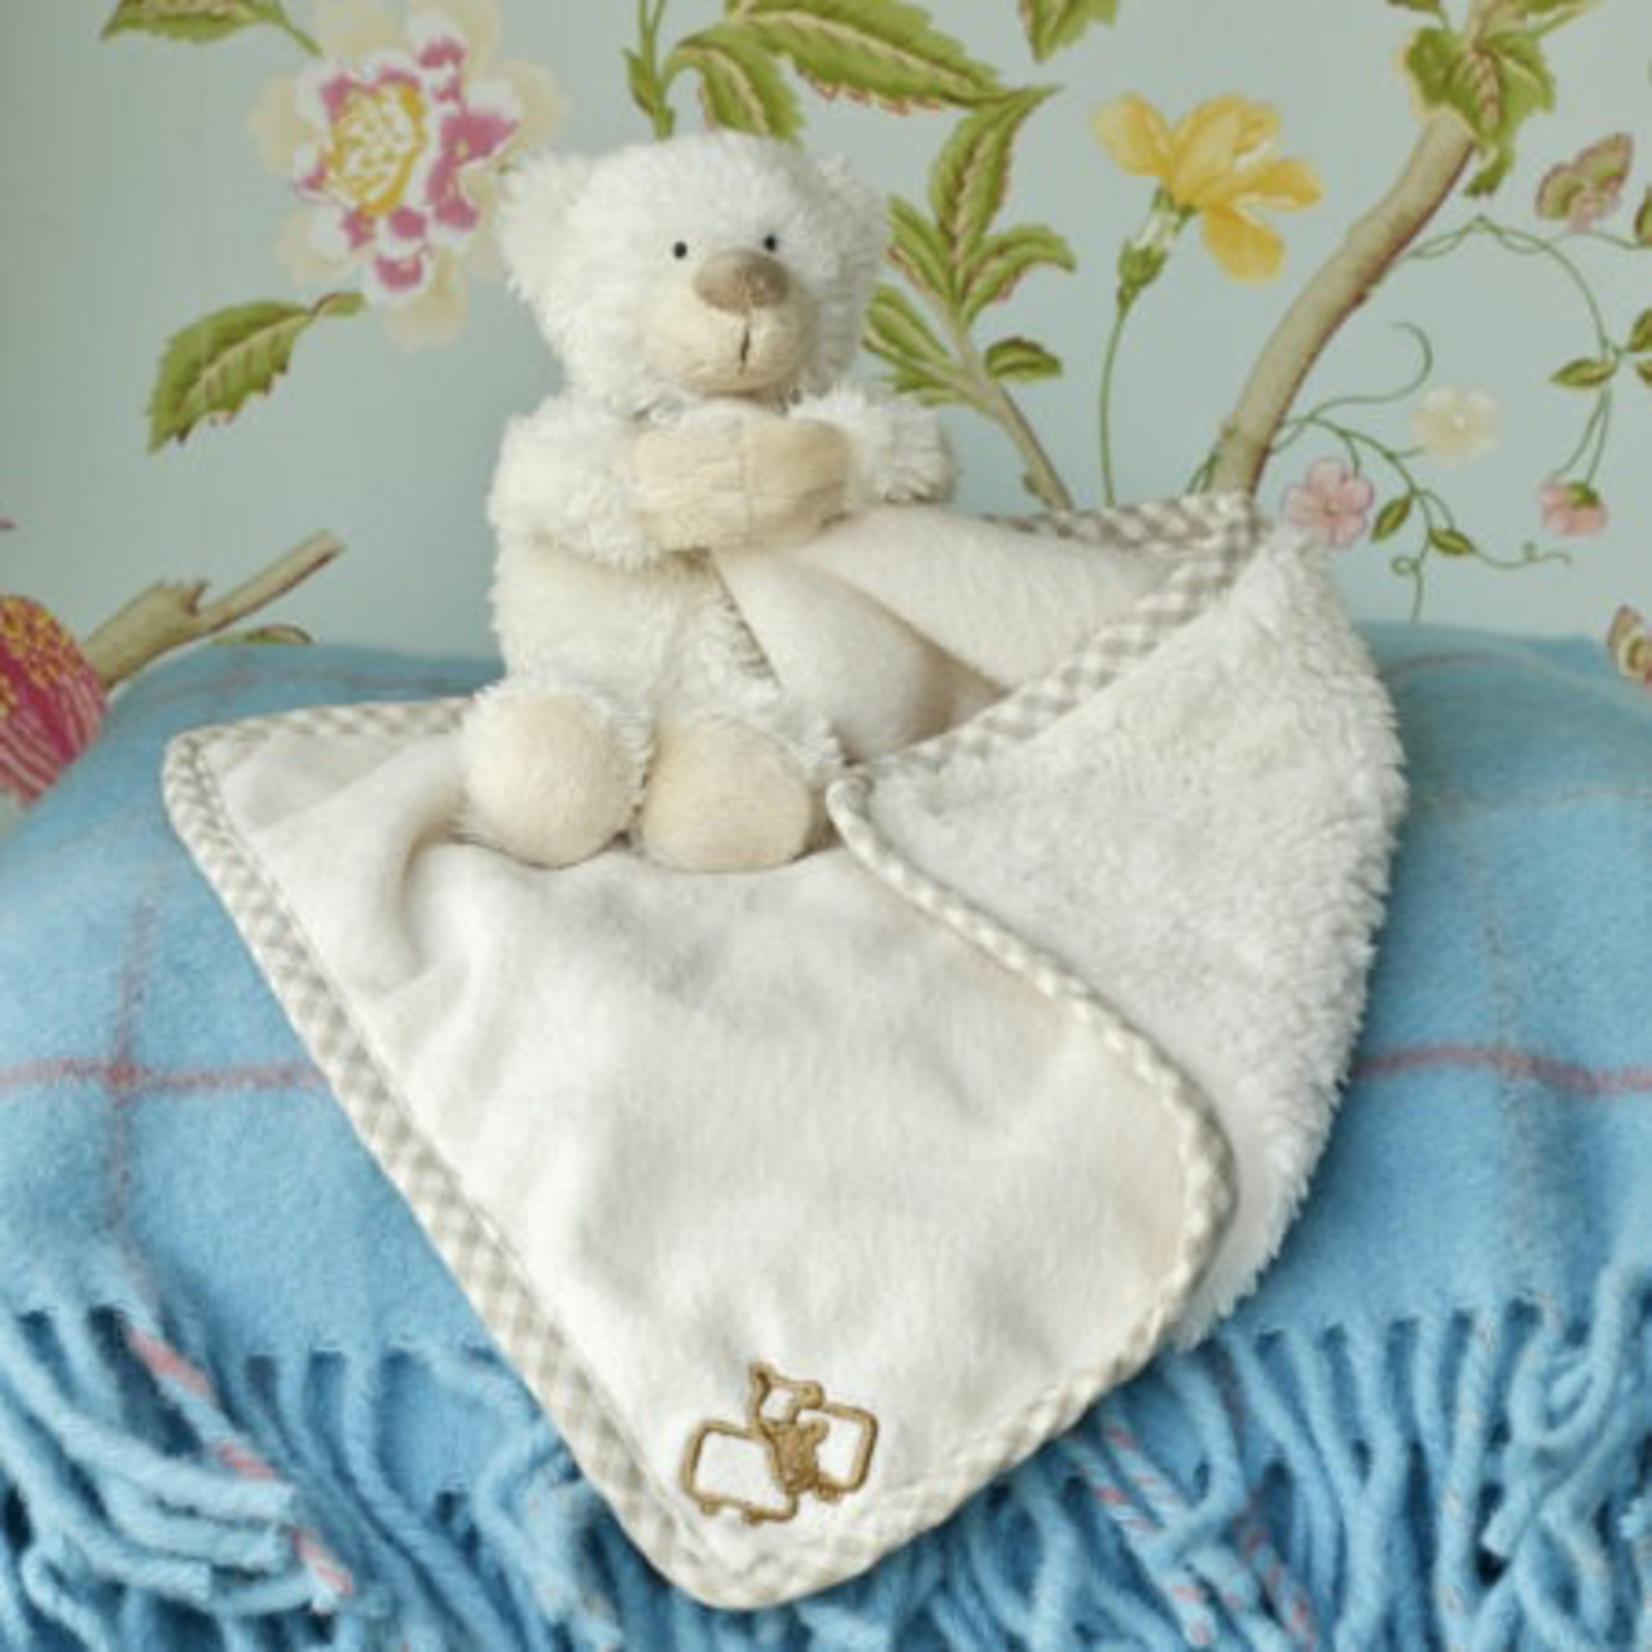 Jomanda Bear Toy Soother